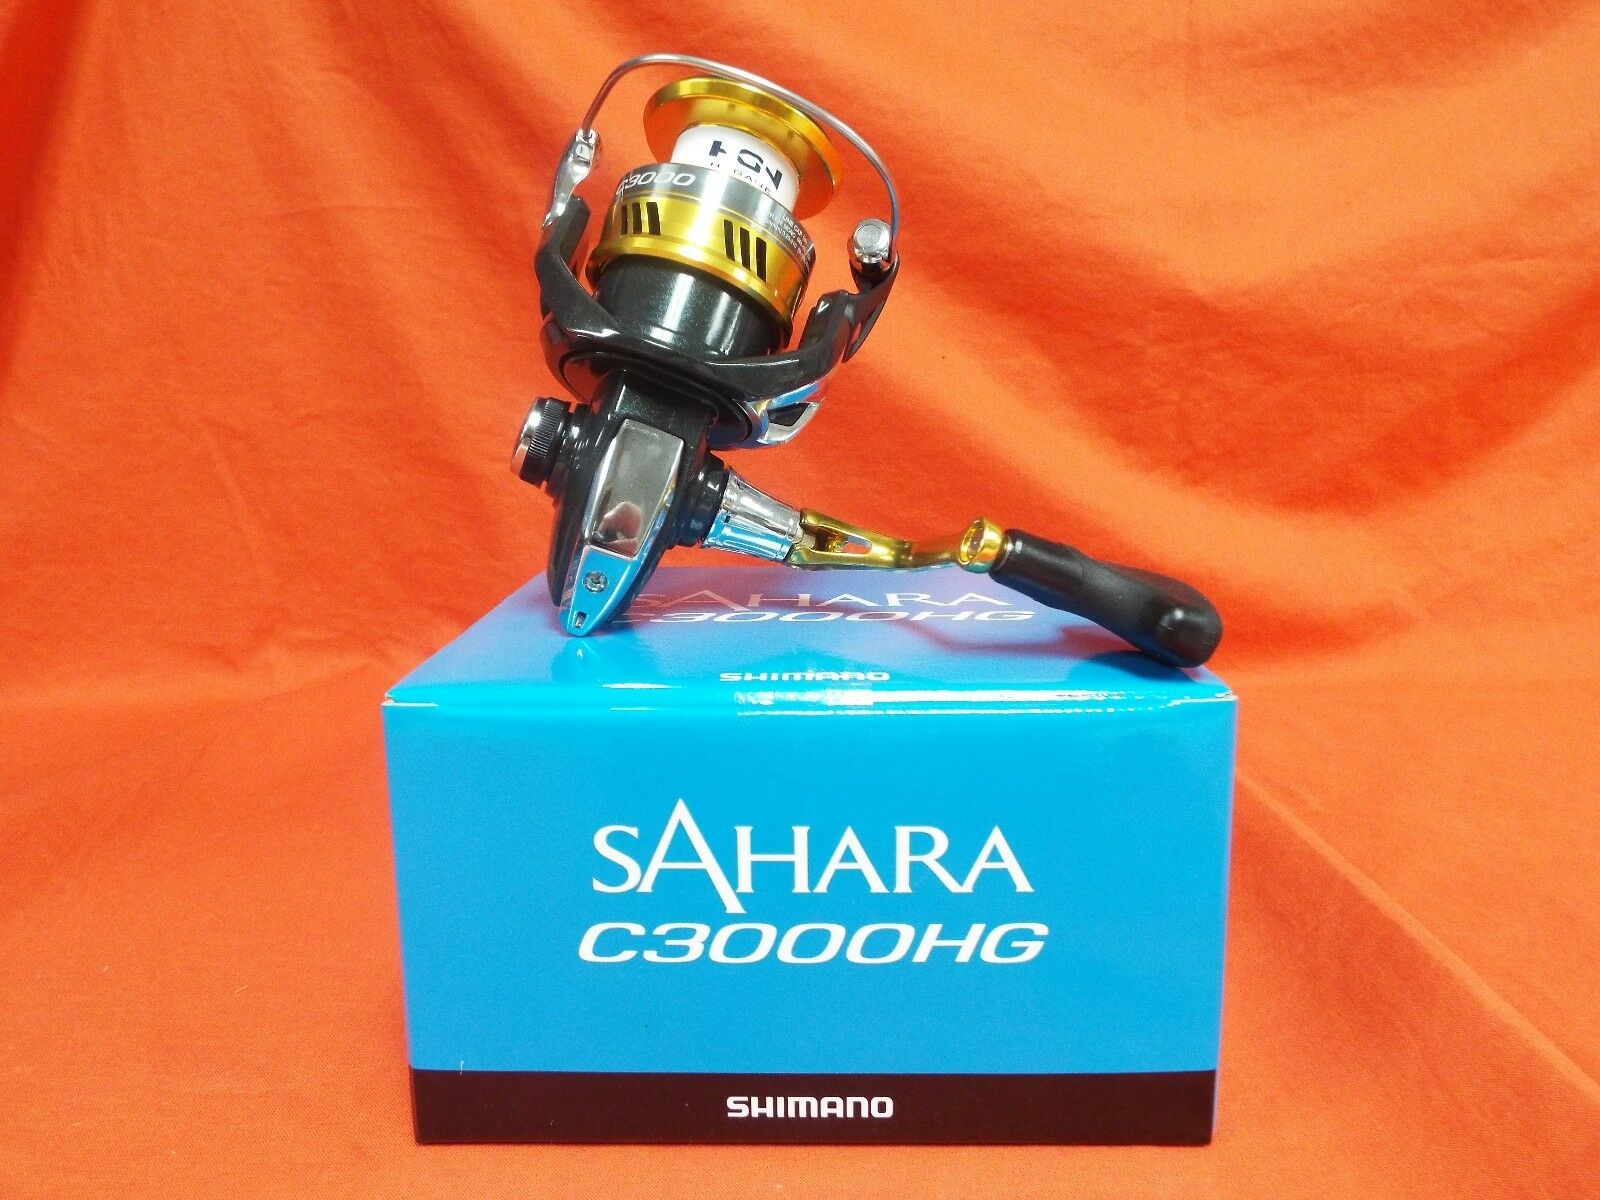 SHIMANO Sahara C3000 HG Spinning Reel 6.2 1 Gear Ratio  SH-C3000HGFI